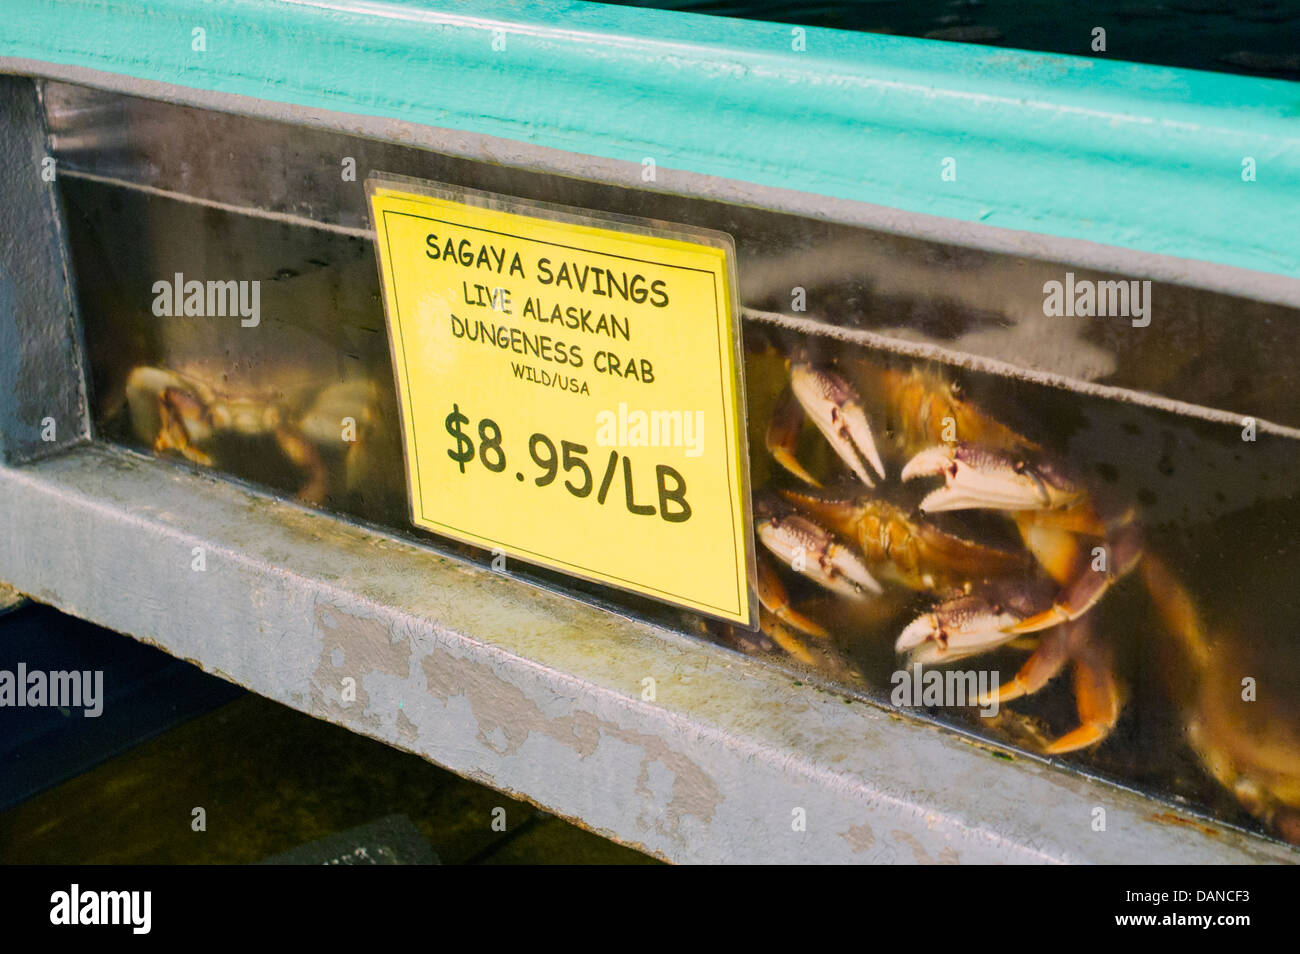 Live Alaska Dungeness Crabs in tanks on display, New Sagaya's Midtown Market, Anchorage, Alaska, USA - Stock Image